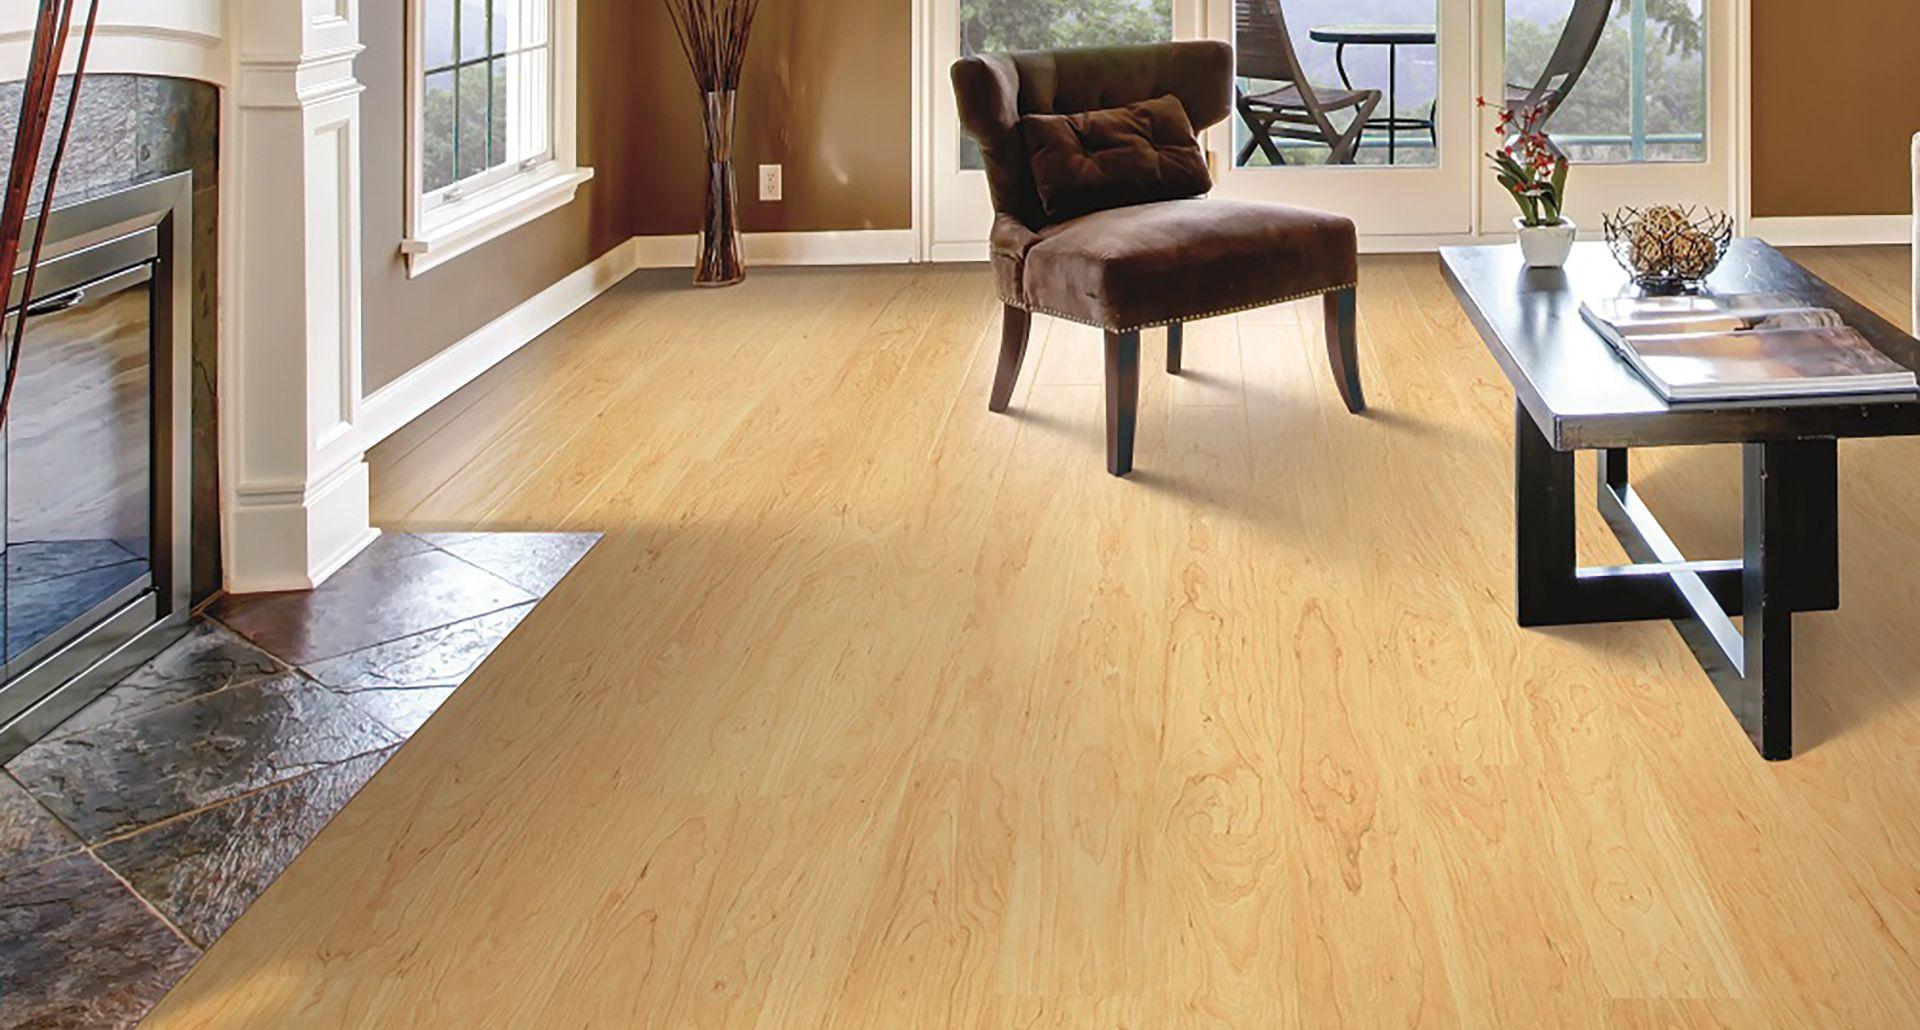 Northern Blonde Maple PERGO Outlast Laminate Flooring